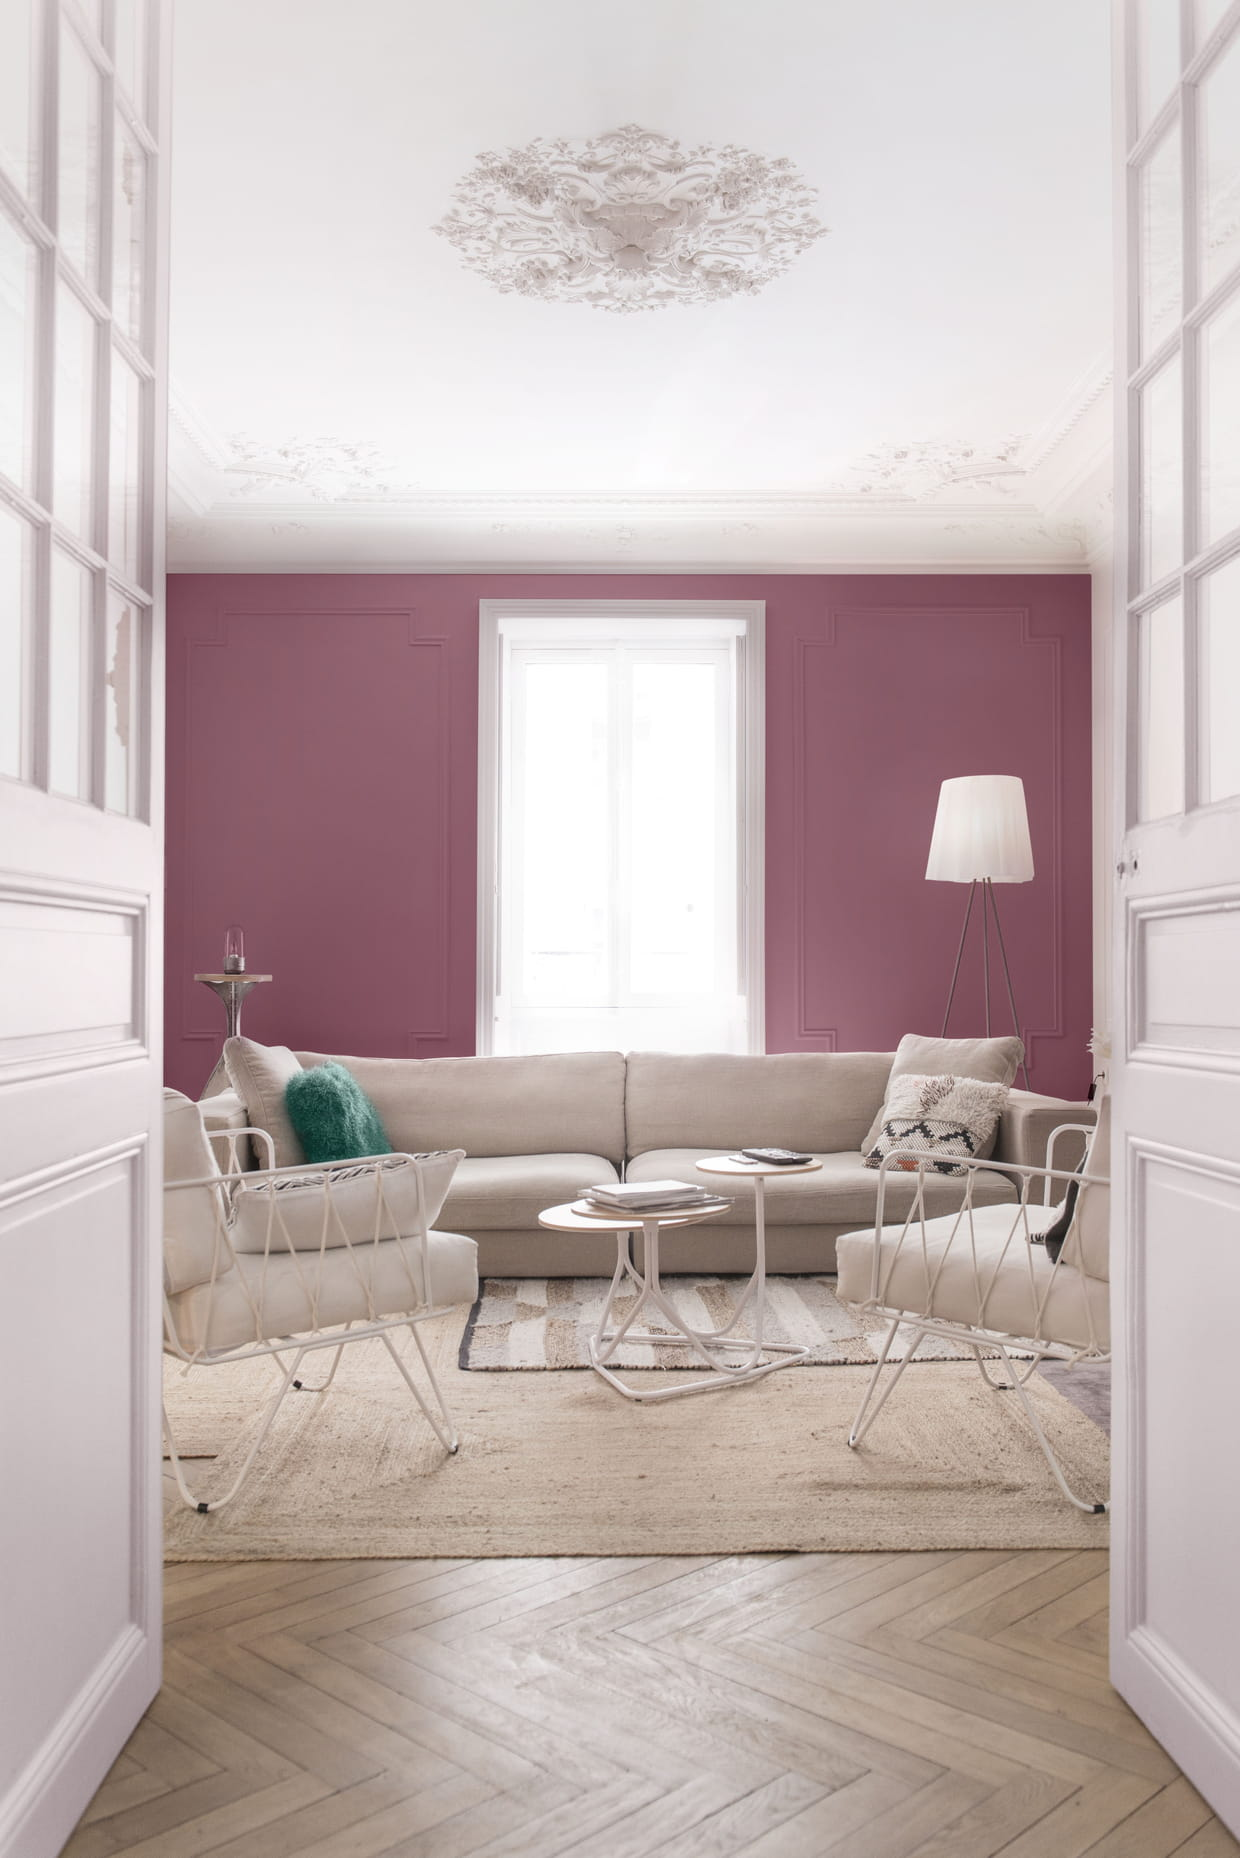 peinture ondi pur velours prune de zolpan. Black Bedroom Furniture Sets. Home Design Ideas